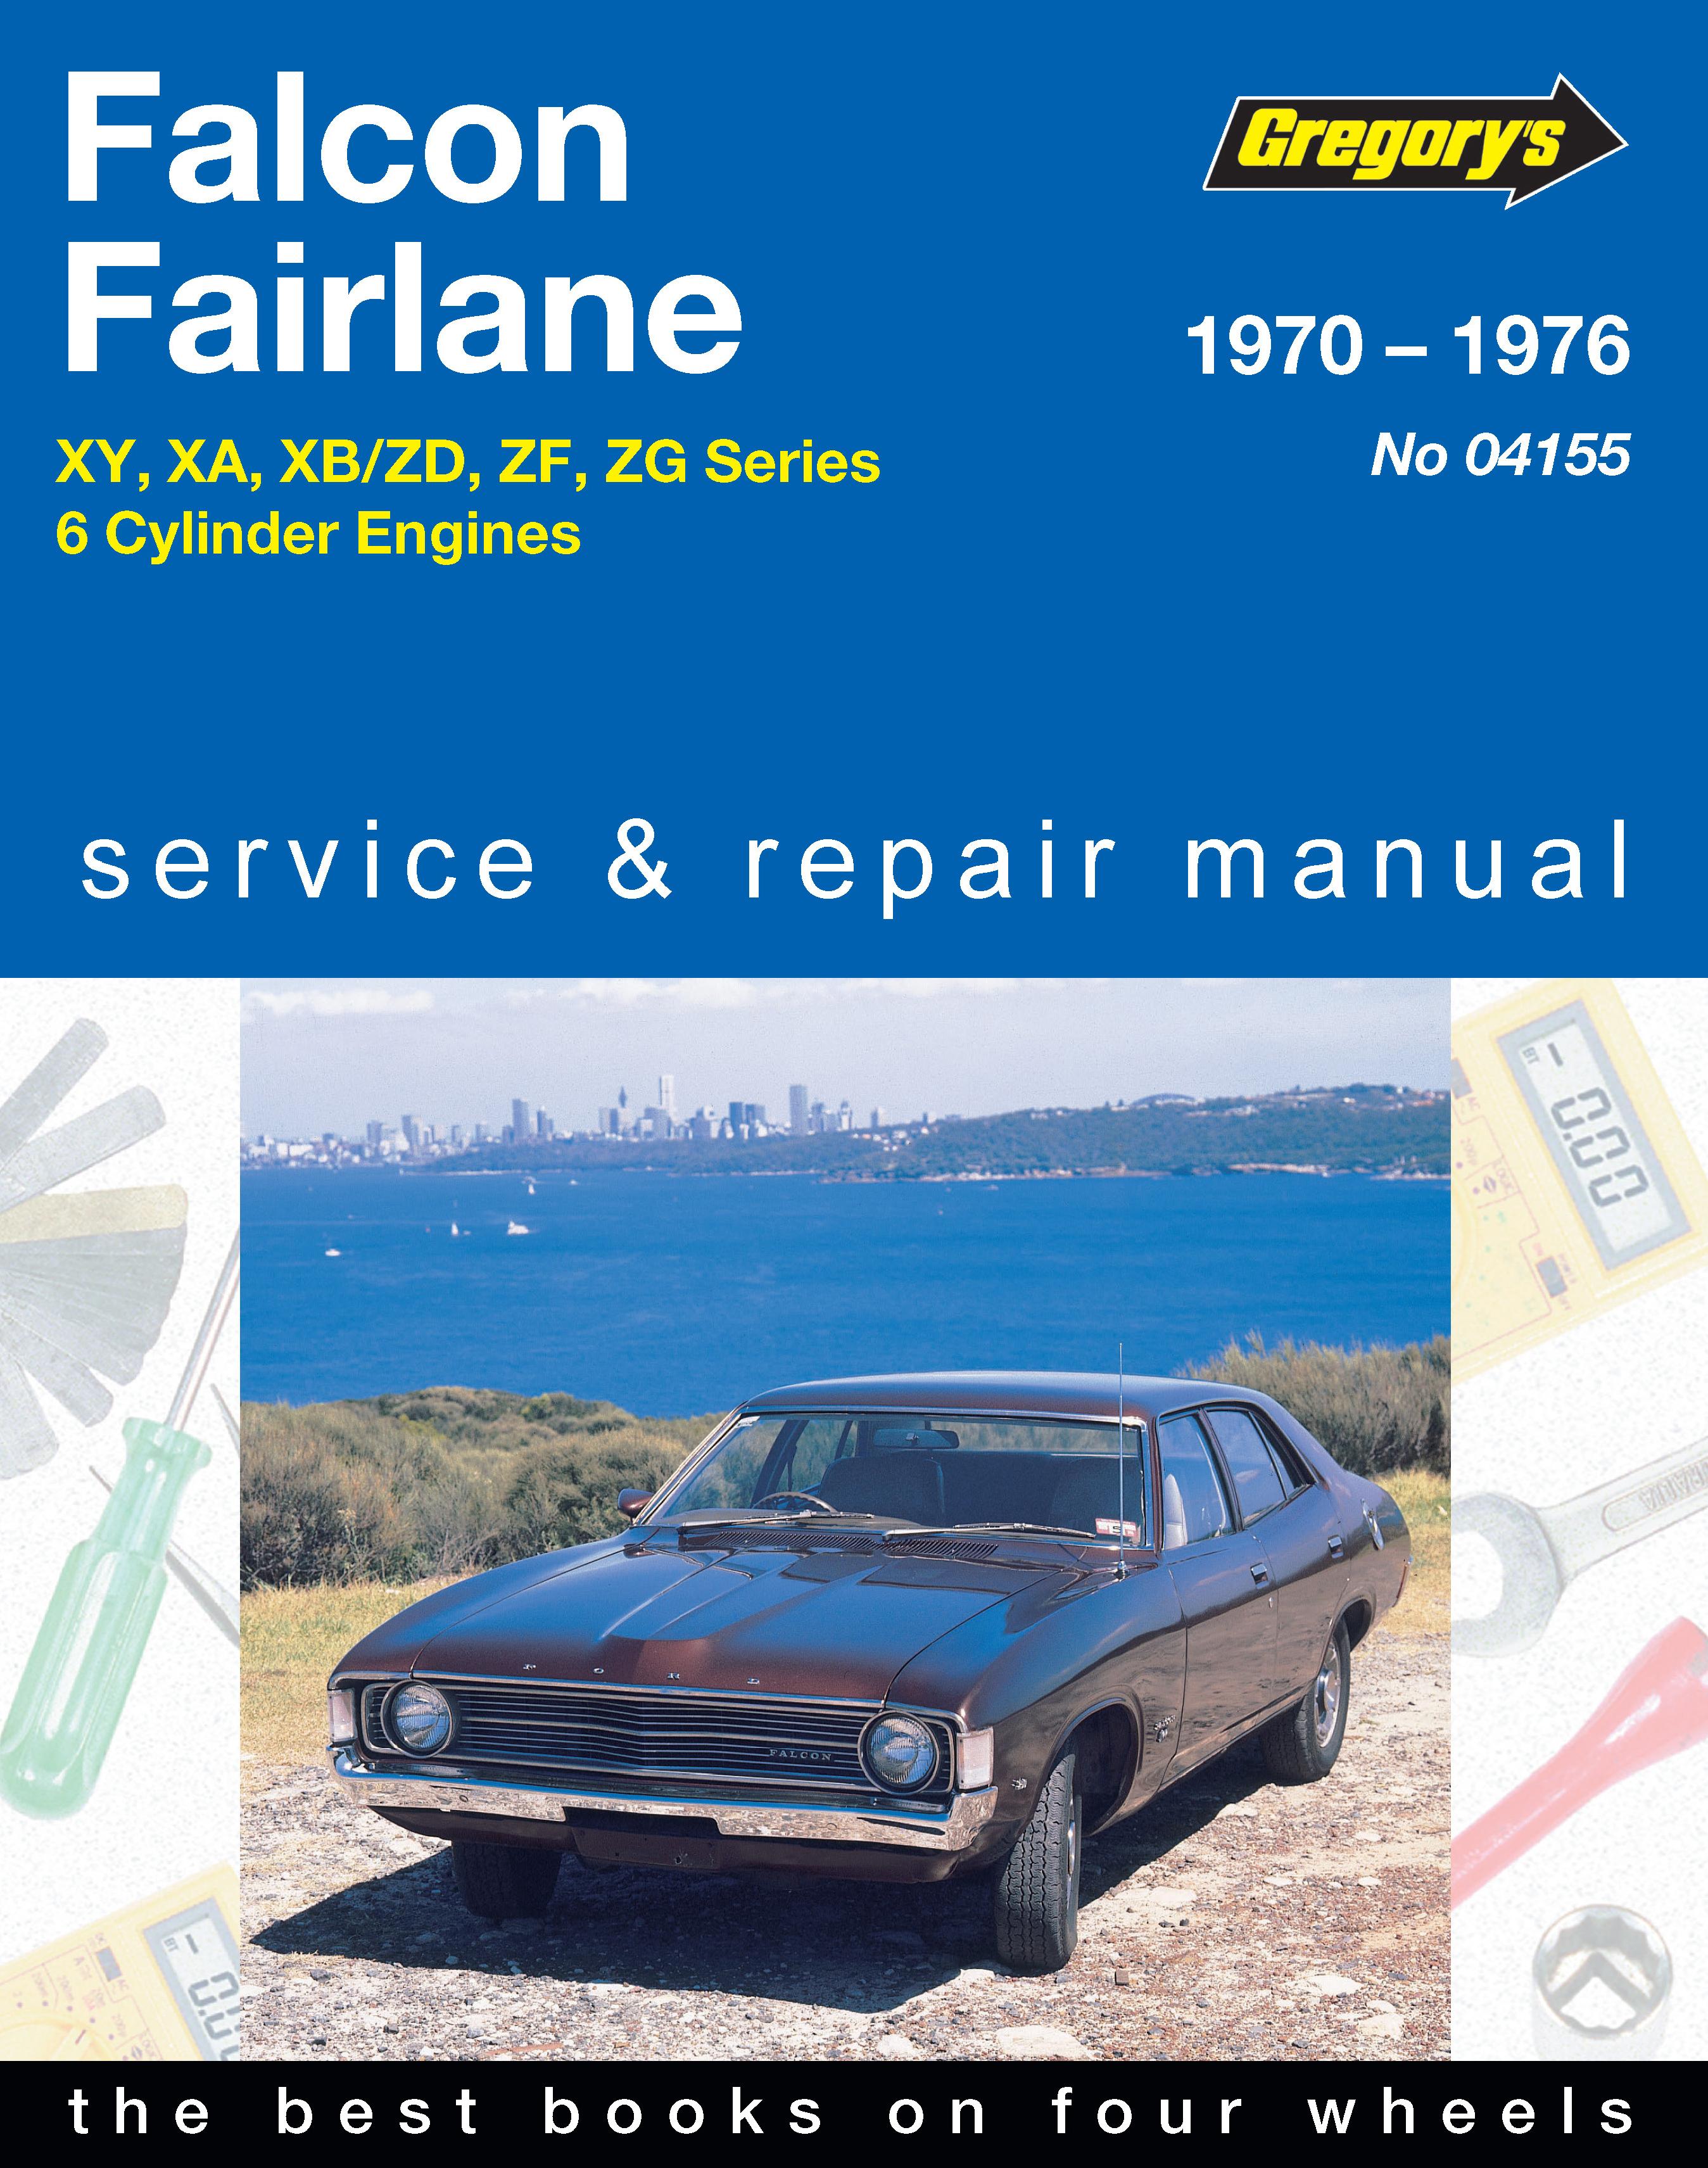 Ford Falcon (1970 - 1976) Repair Manuals